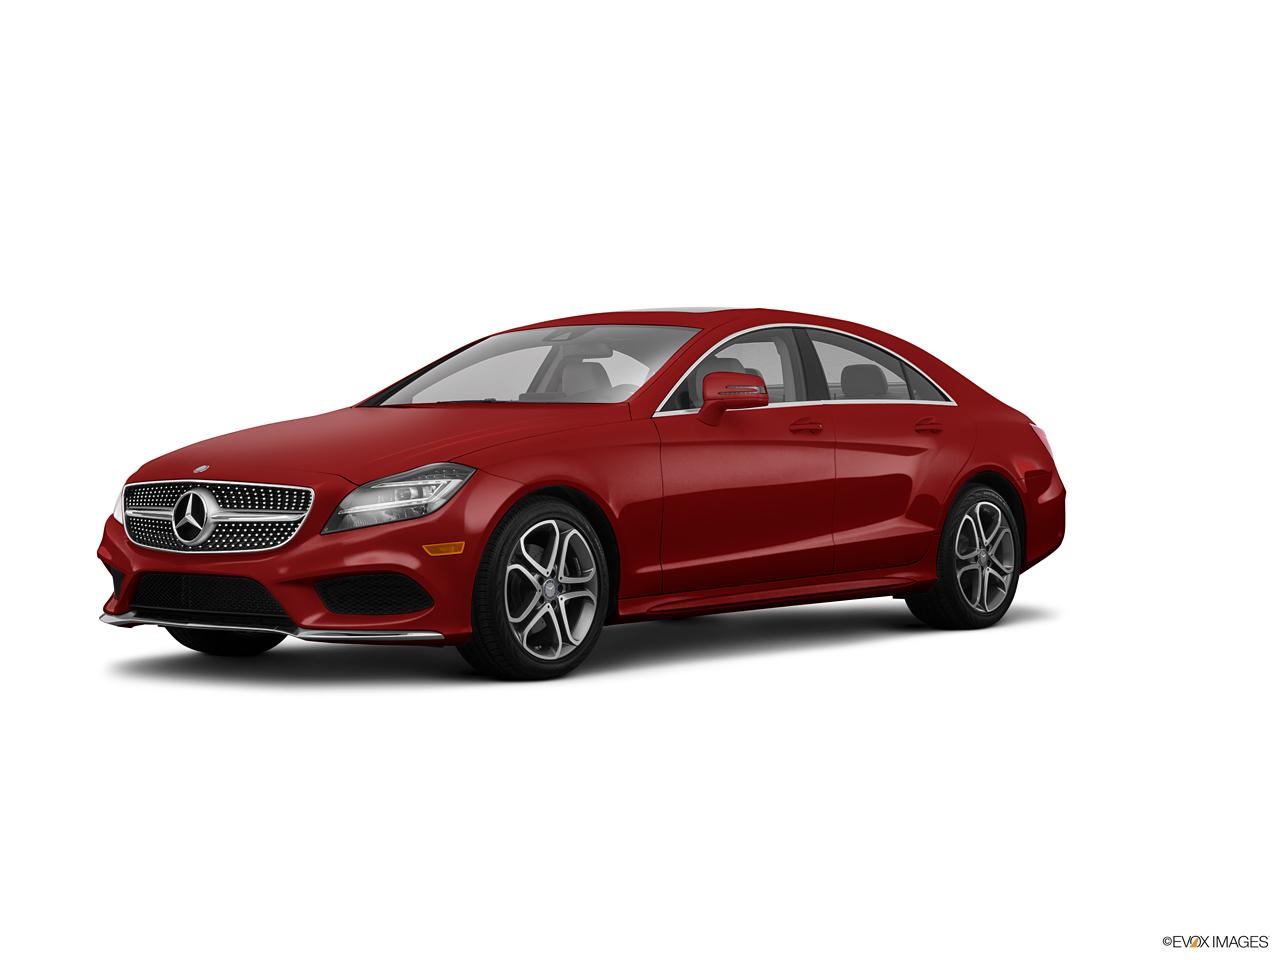 car pictures list for mercedes benz cls class 2016 cls 400 uae yallamotor. Black Bedroom Furniture Sets. Home Design Ideas